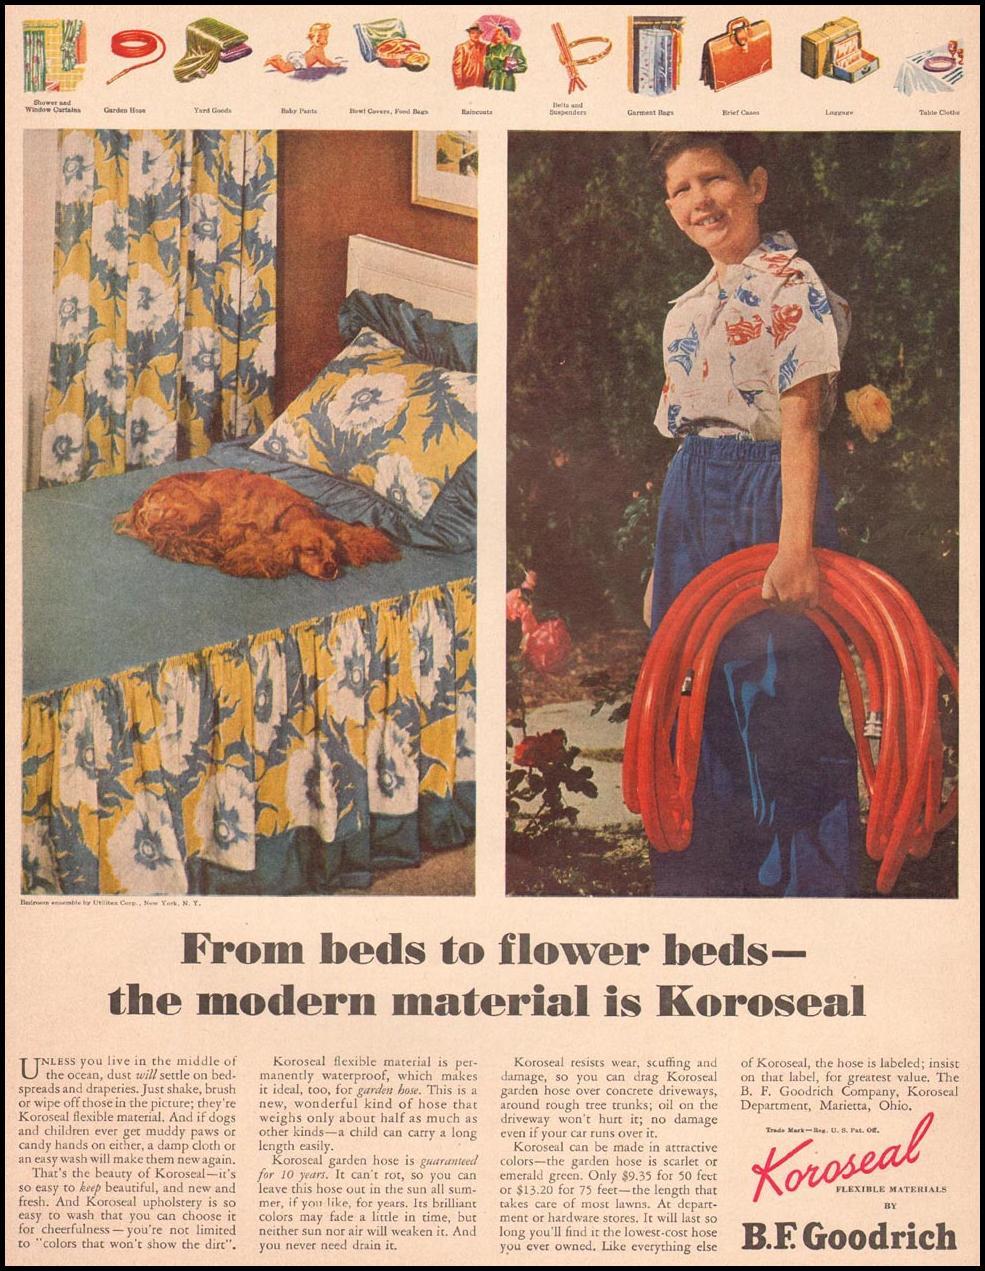 GOODRICH KOROSEAL FLEXIBLE MATERIAL LIFE 04/17/1950